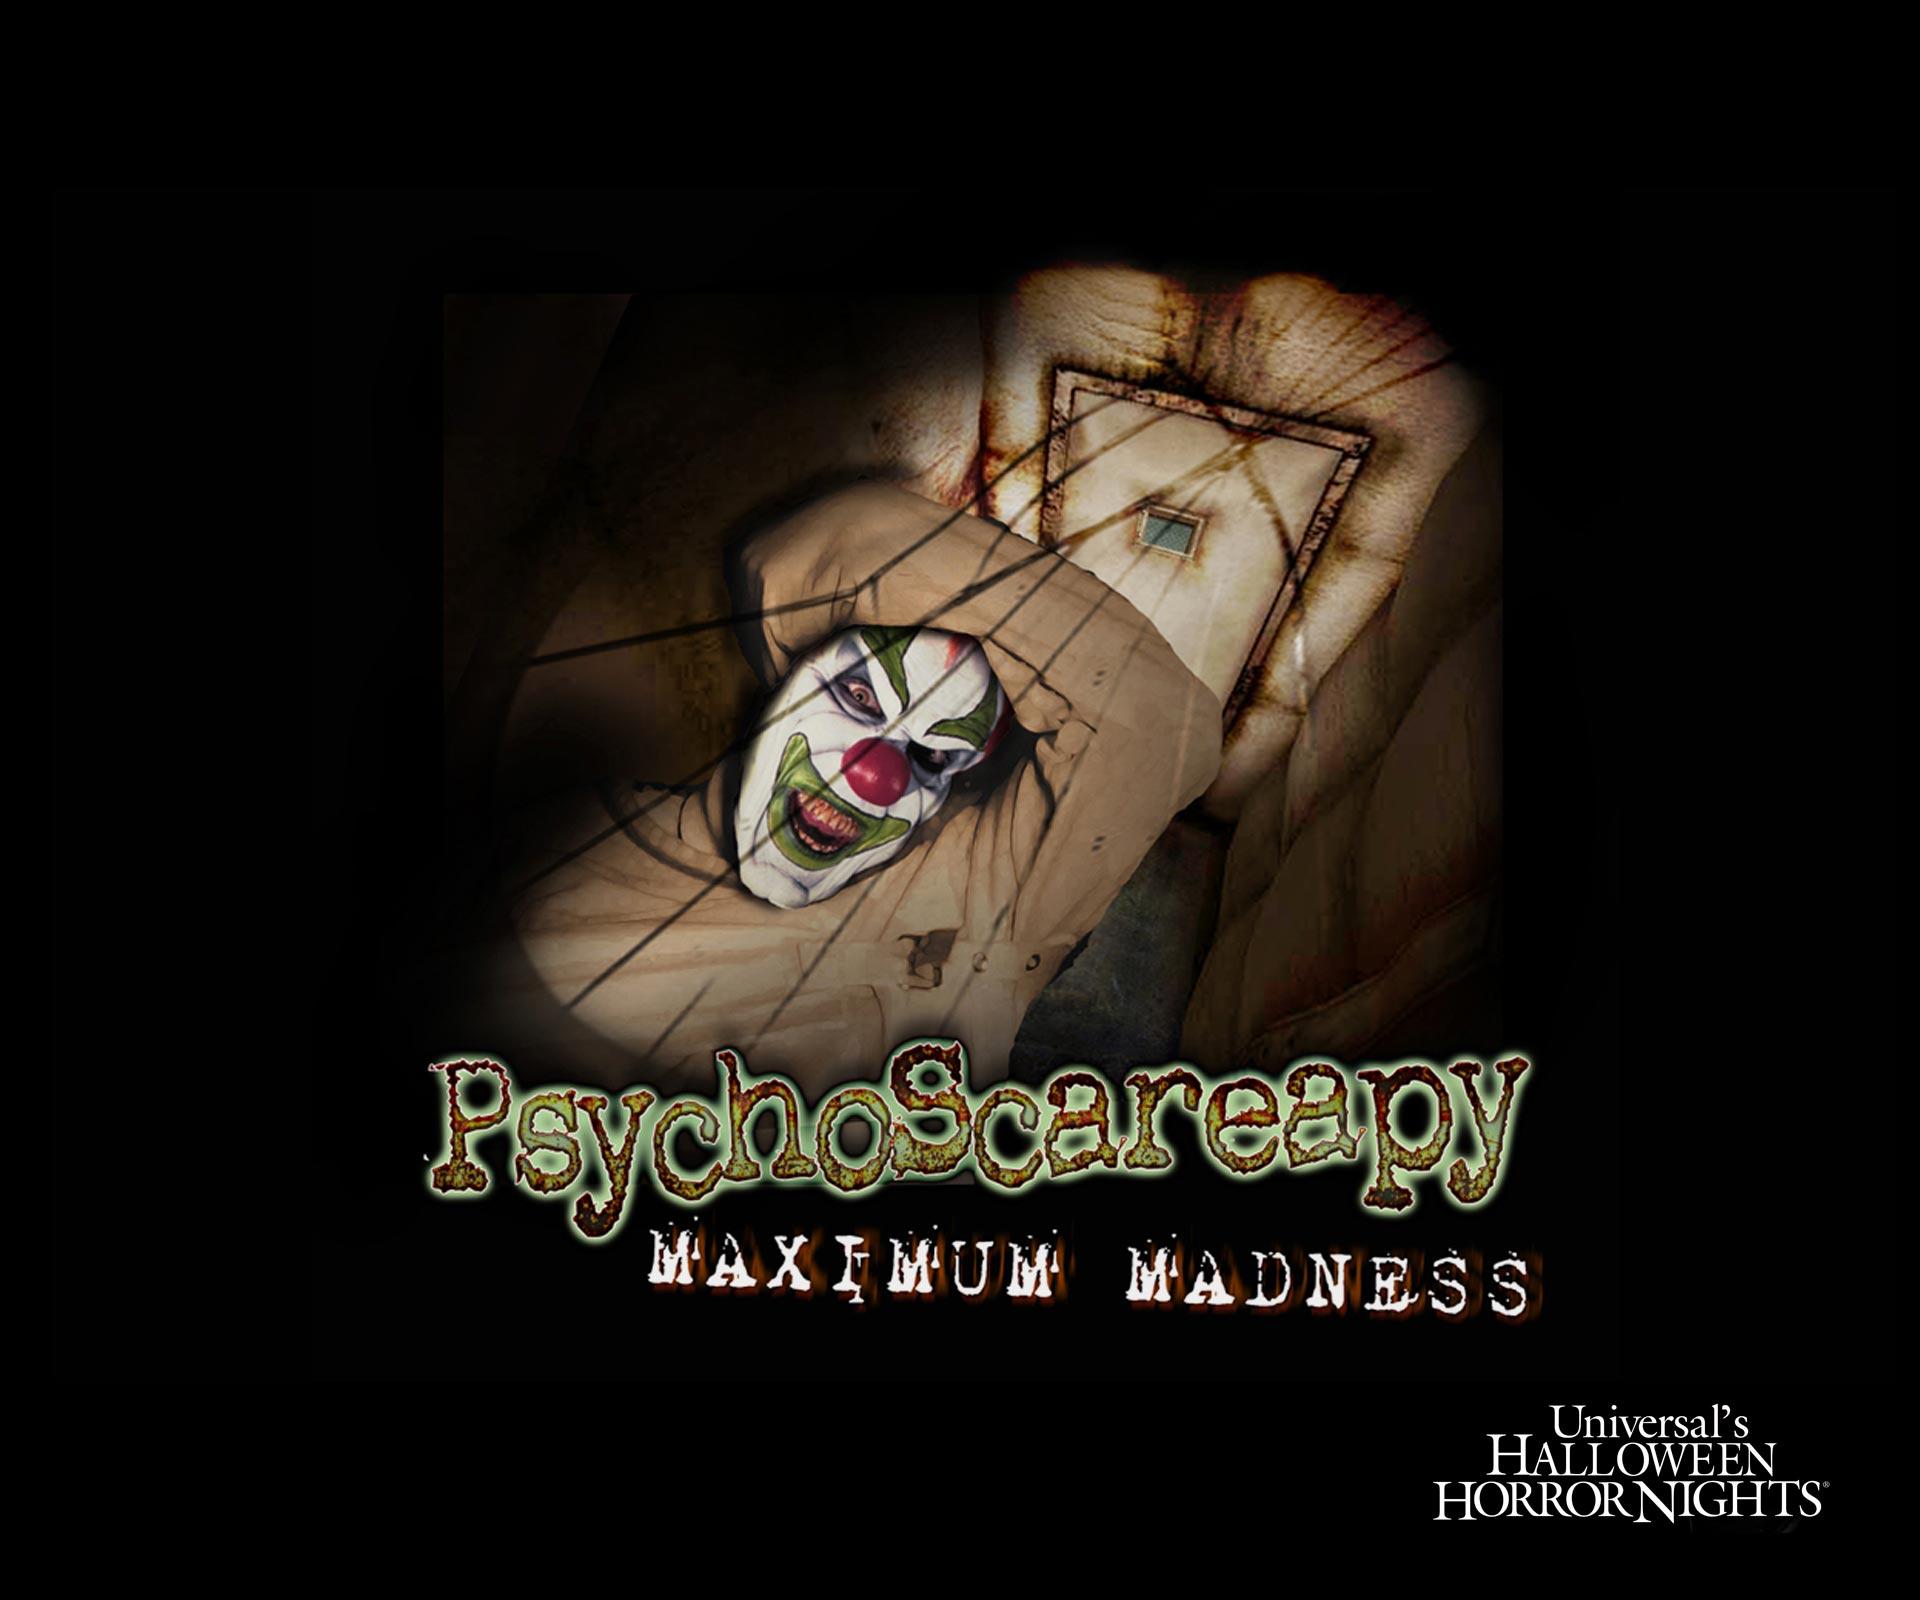 File:Psychoscareapy-maximum-madness-yOSB.jpg